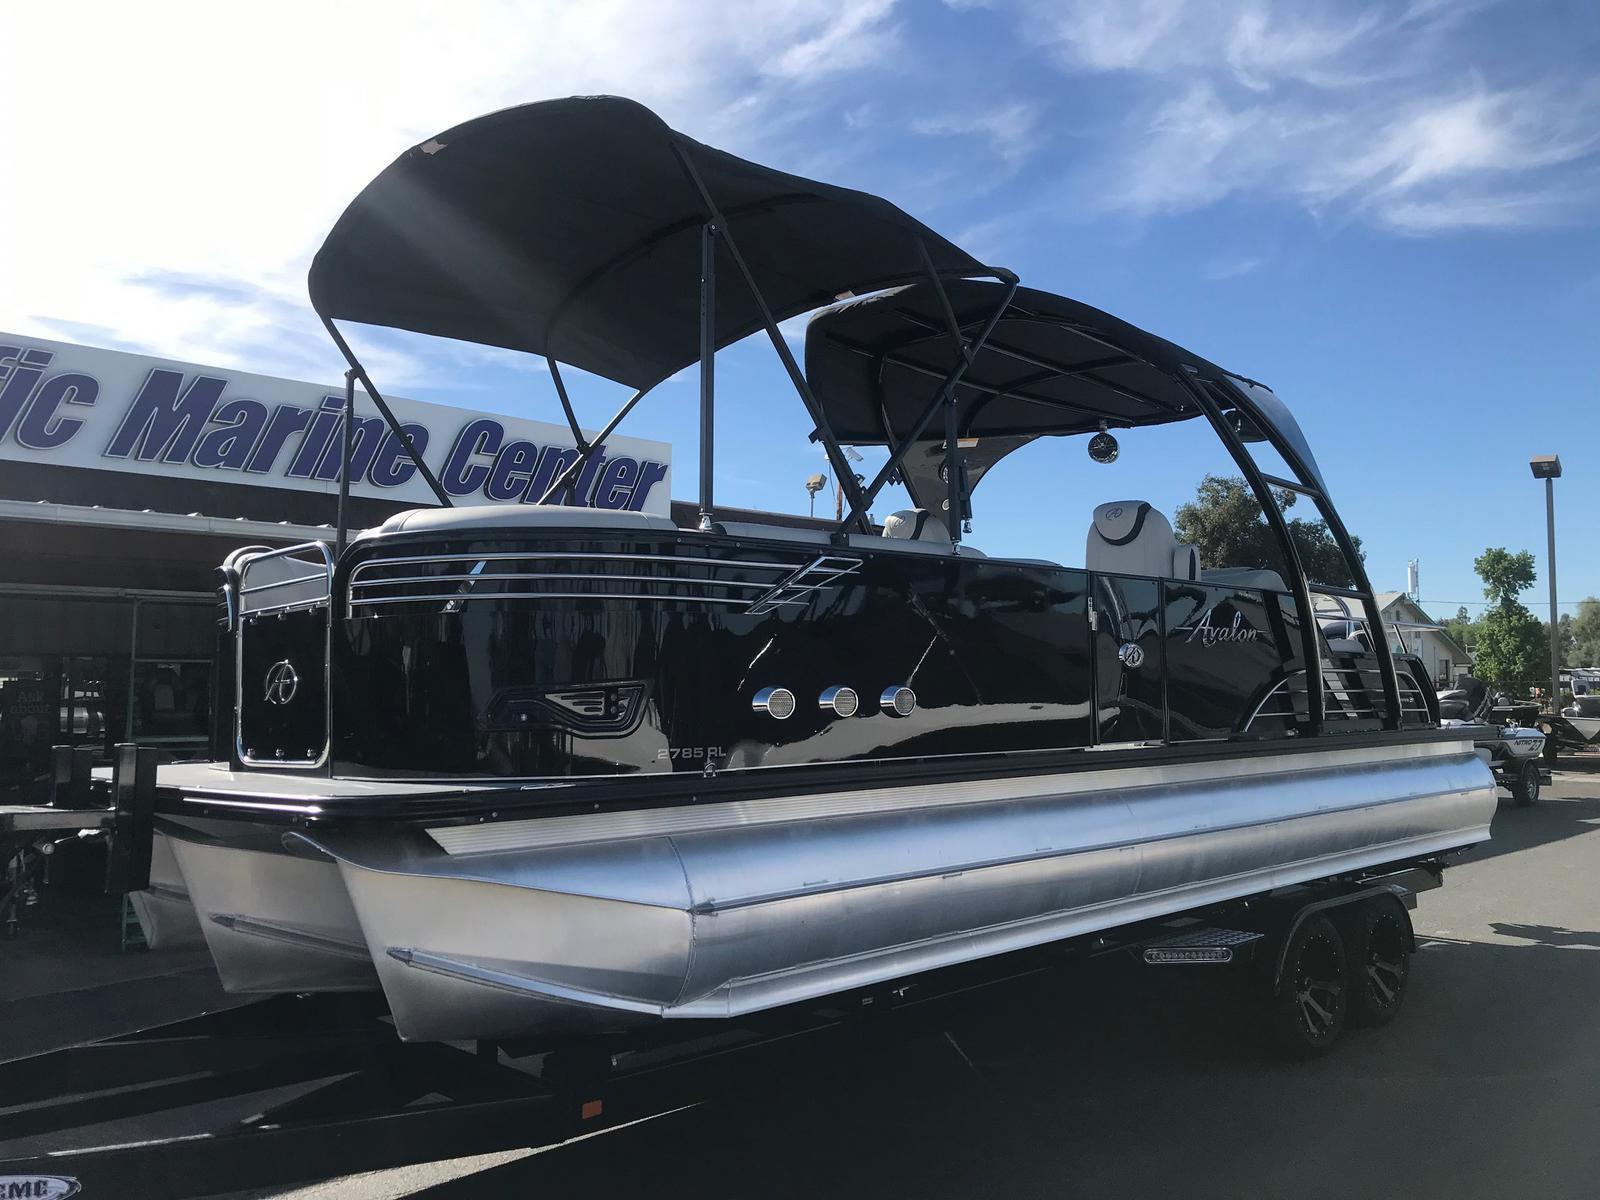 Avalon Ambassador Rear Lounge 27' w/ 400HP Mercury Racing! Has engine warranty Til June 2021